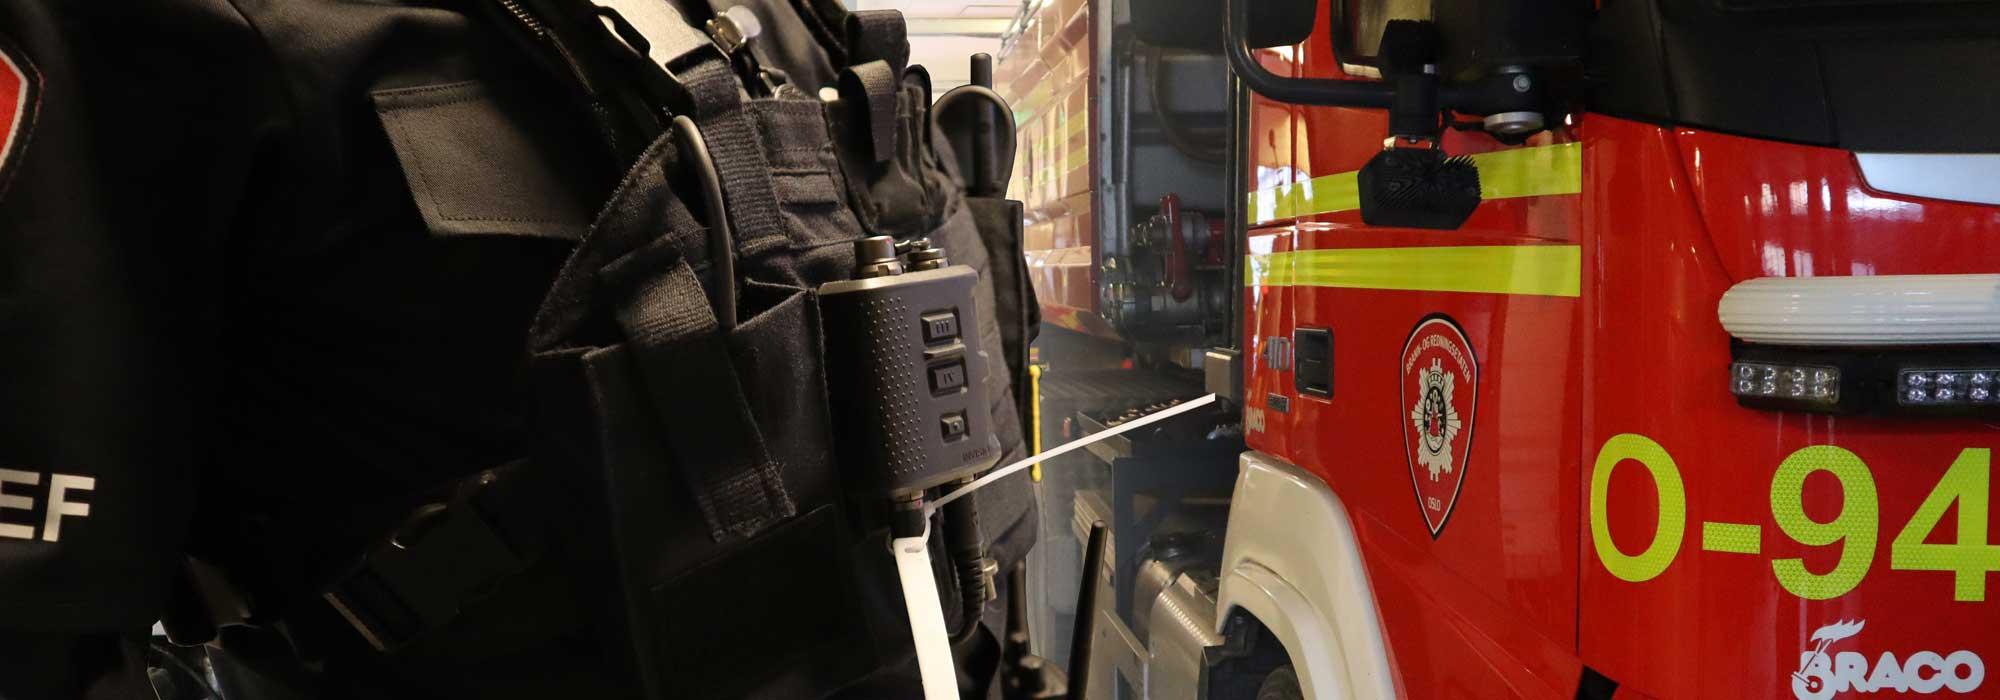 rfid utstyr brannuniform brannbil